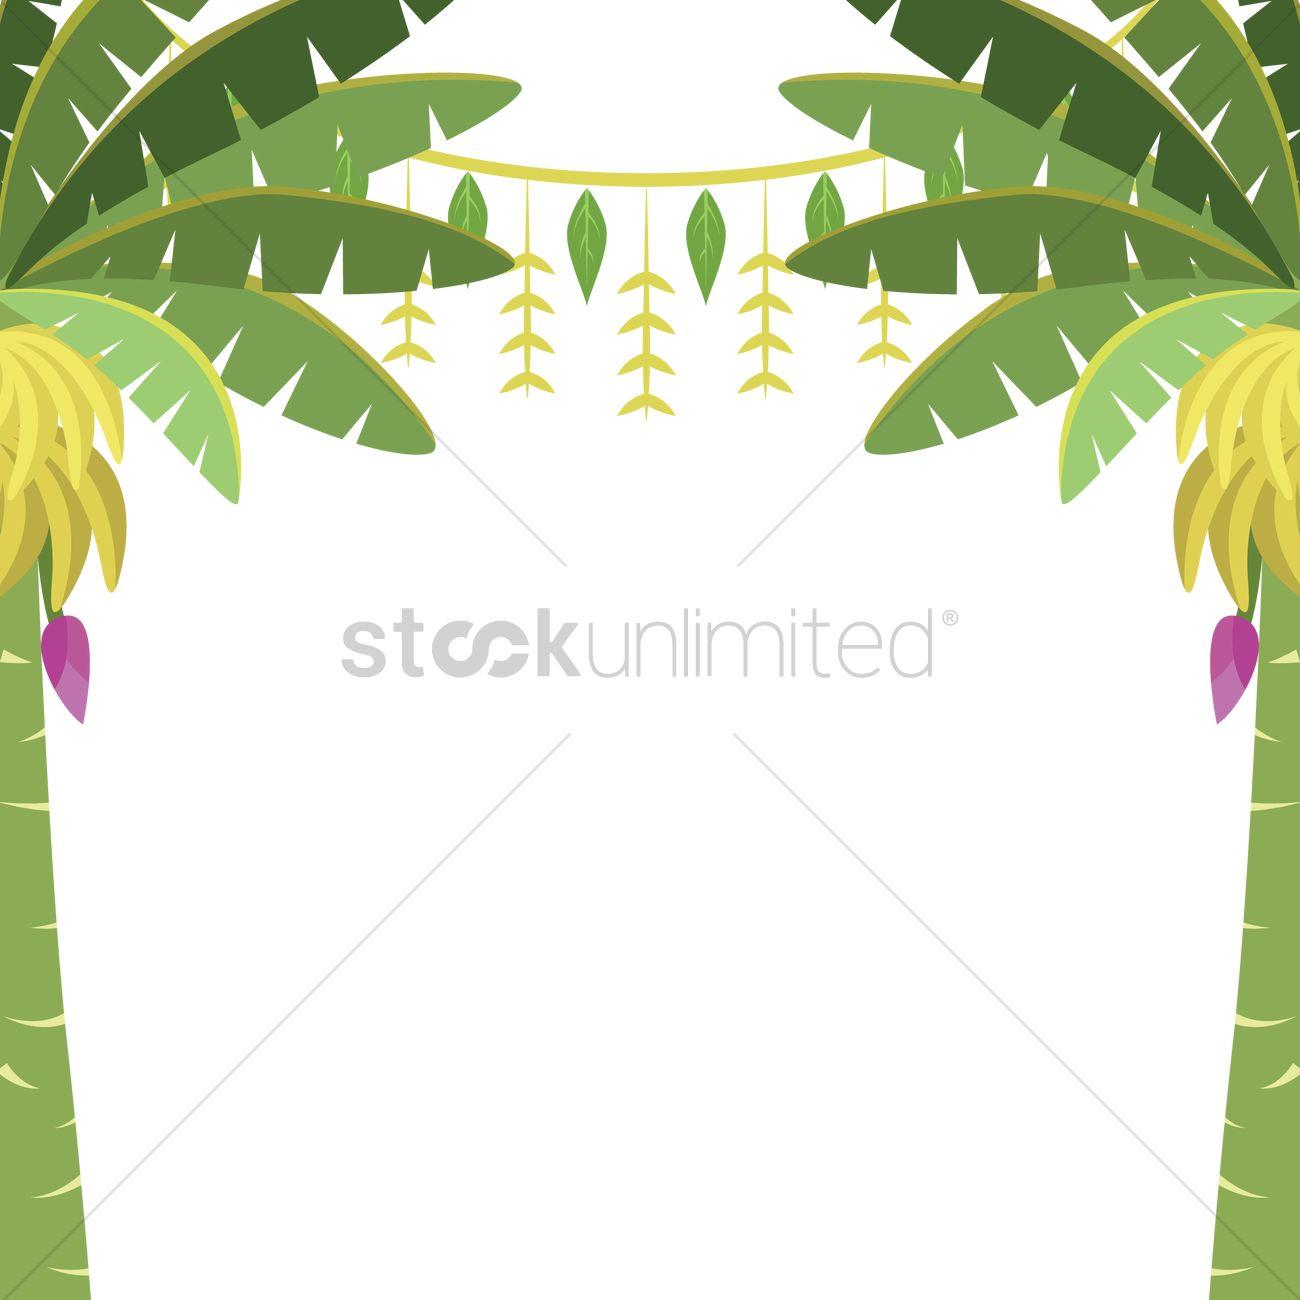 Banana Trees With Toran Vector Image 1244172 Stockunlimited